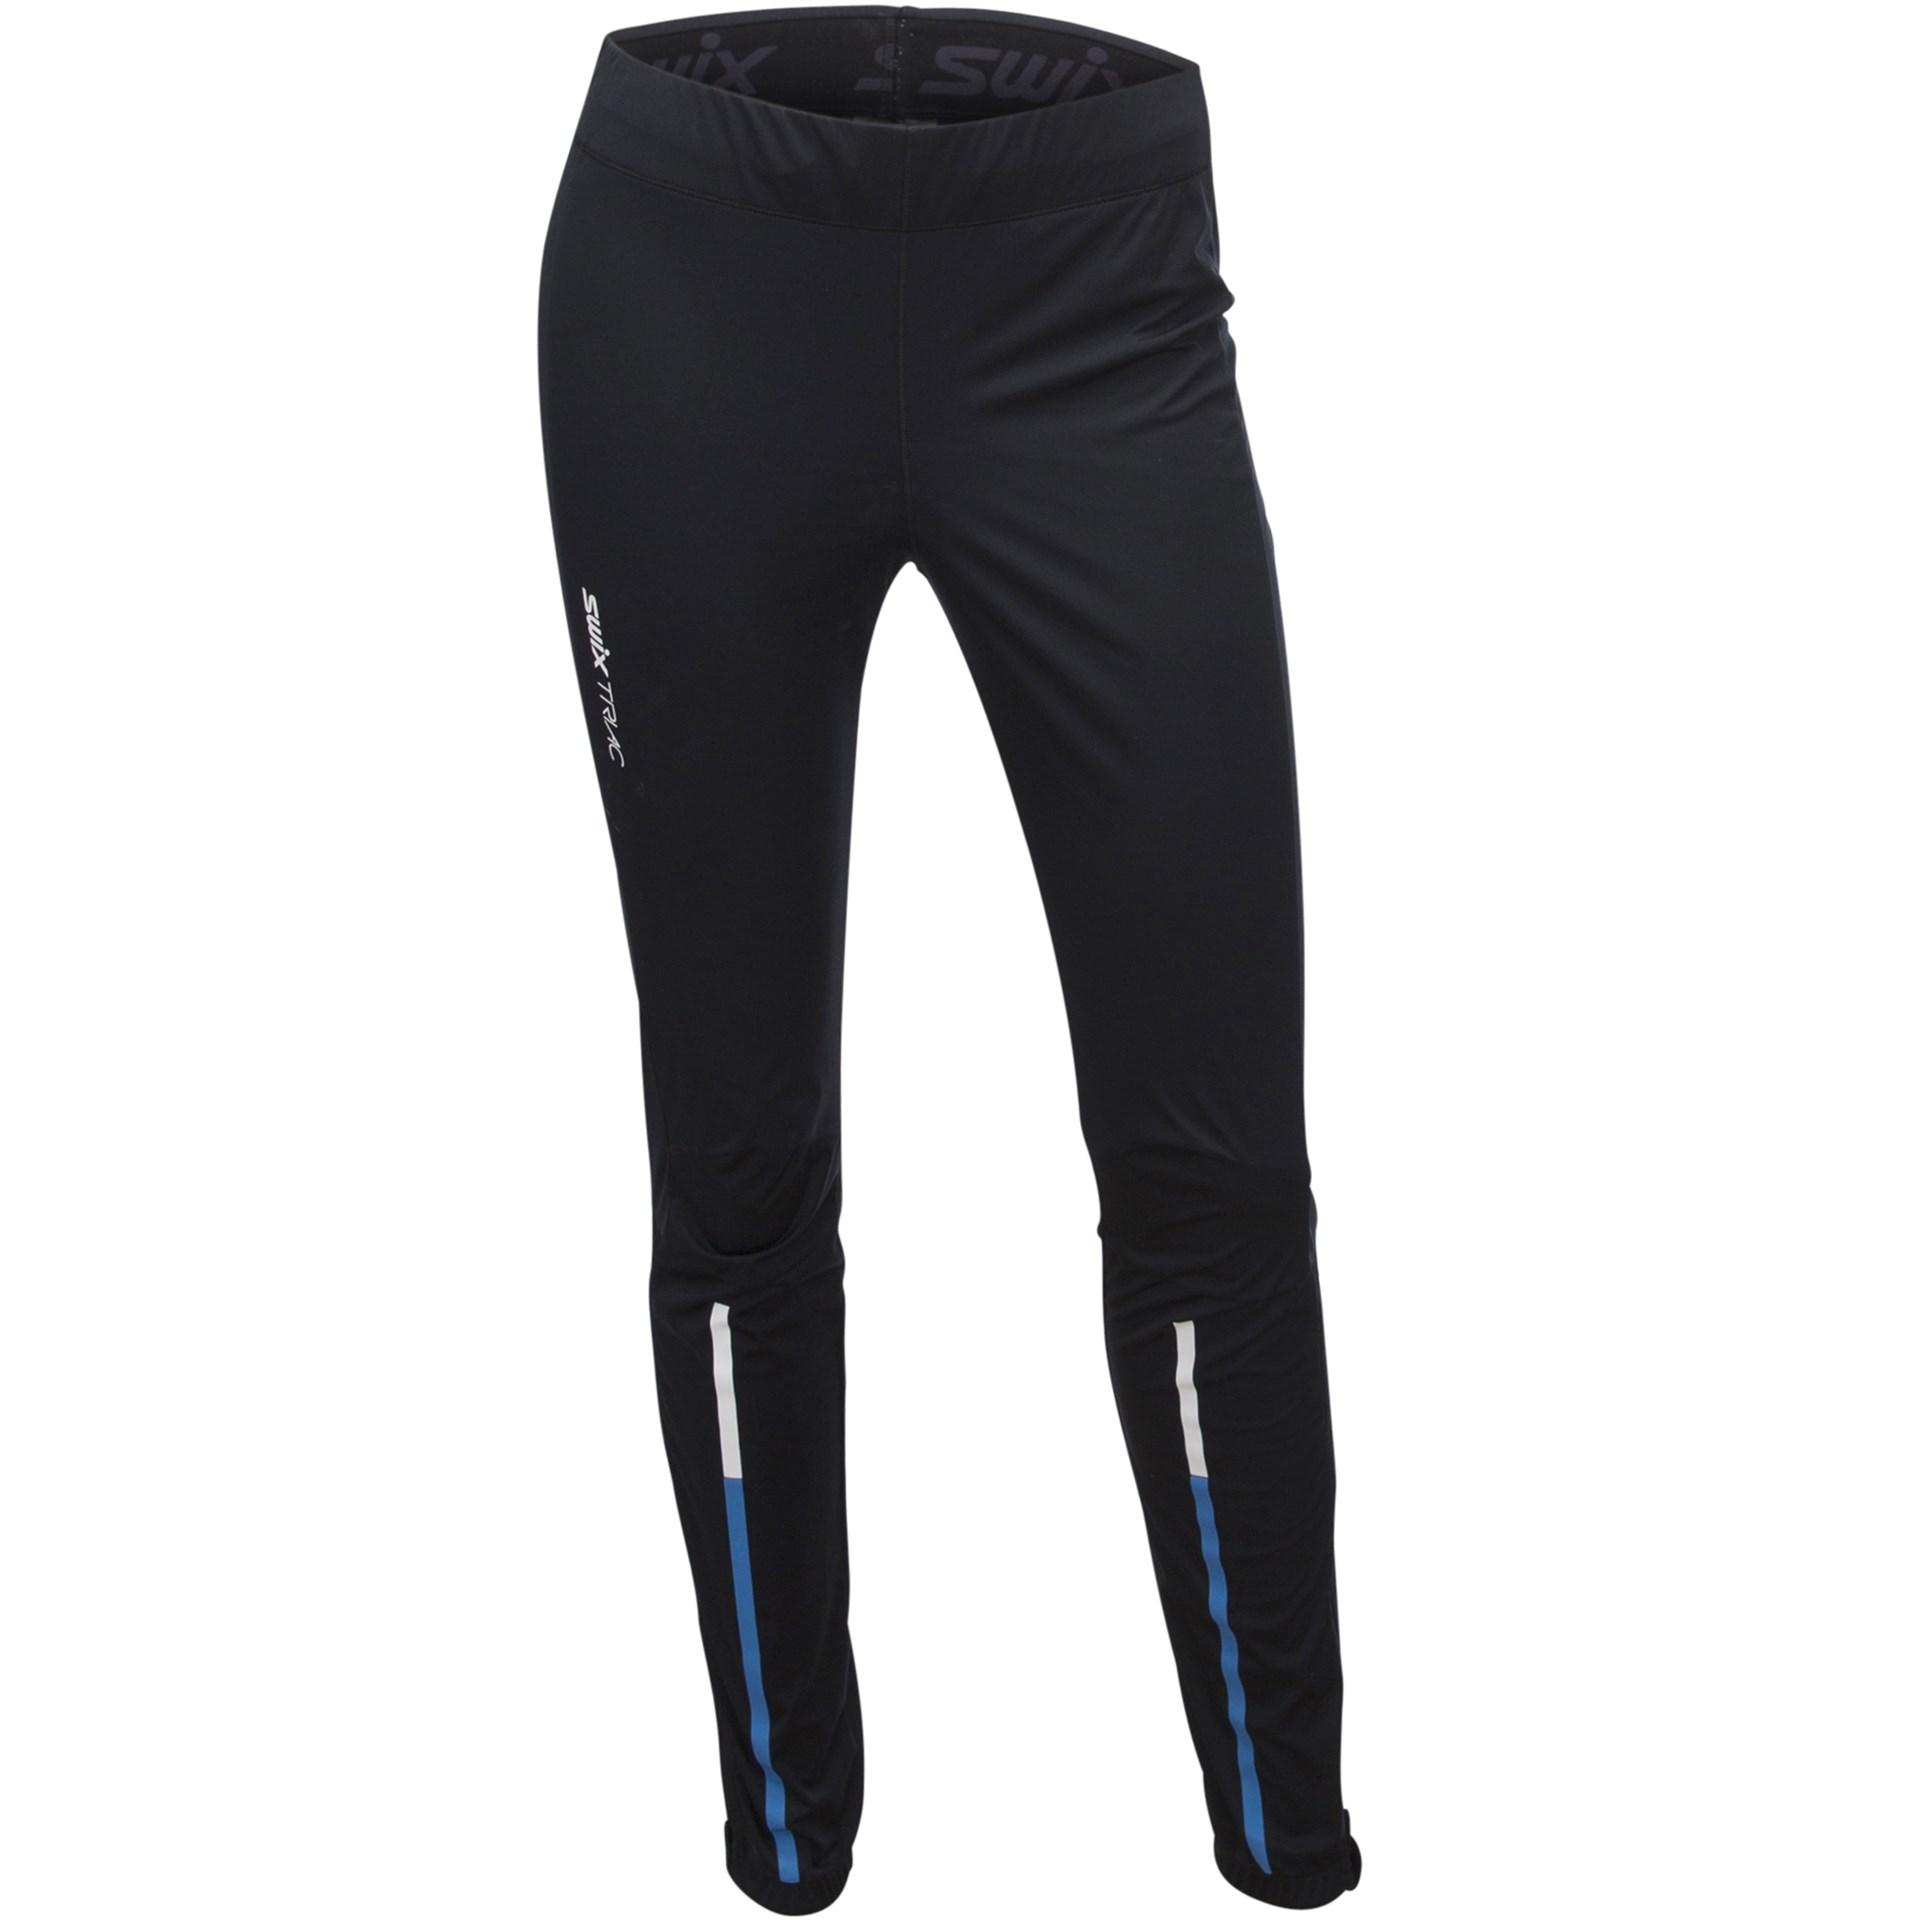 c84261c2 Bilde: Swix Triac 3.0 pants W, langrennsbukse dame - Black 22296-10000